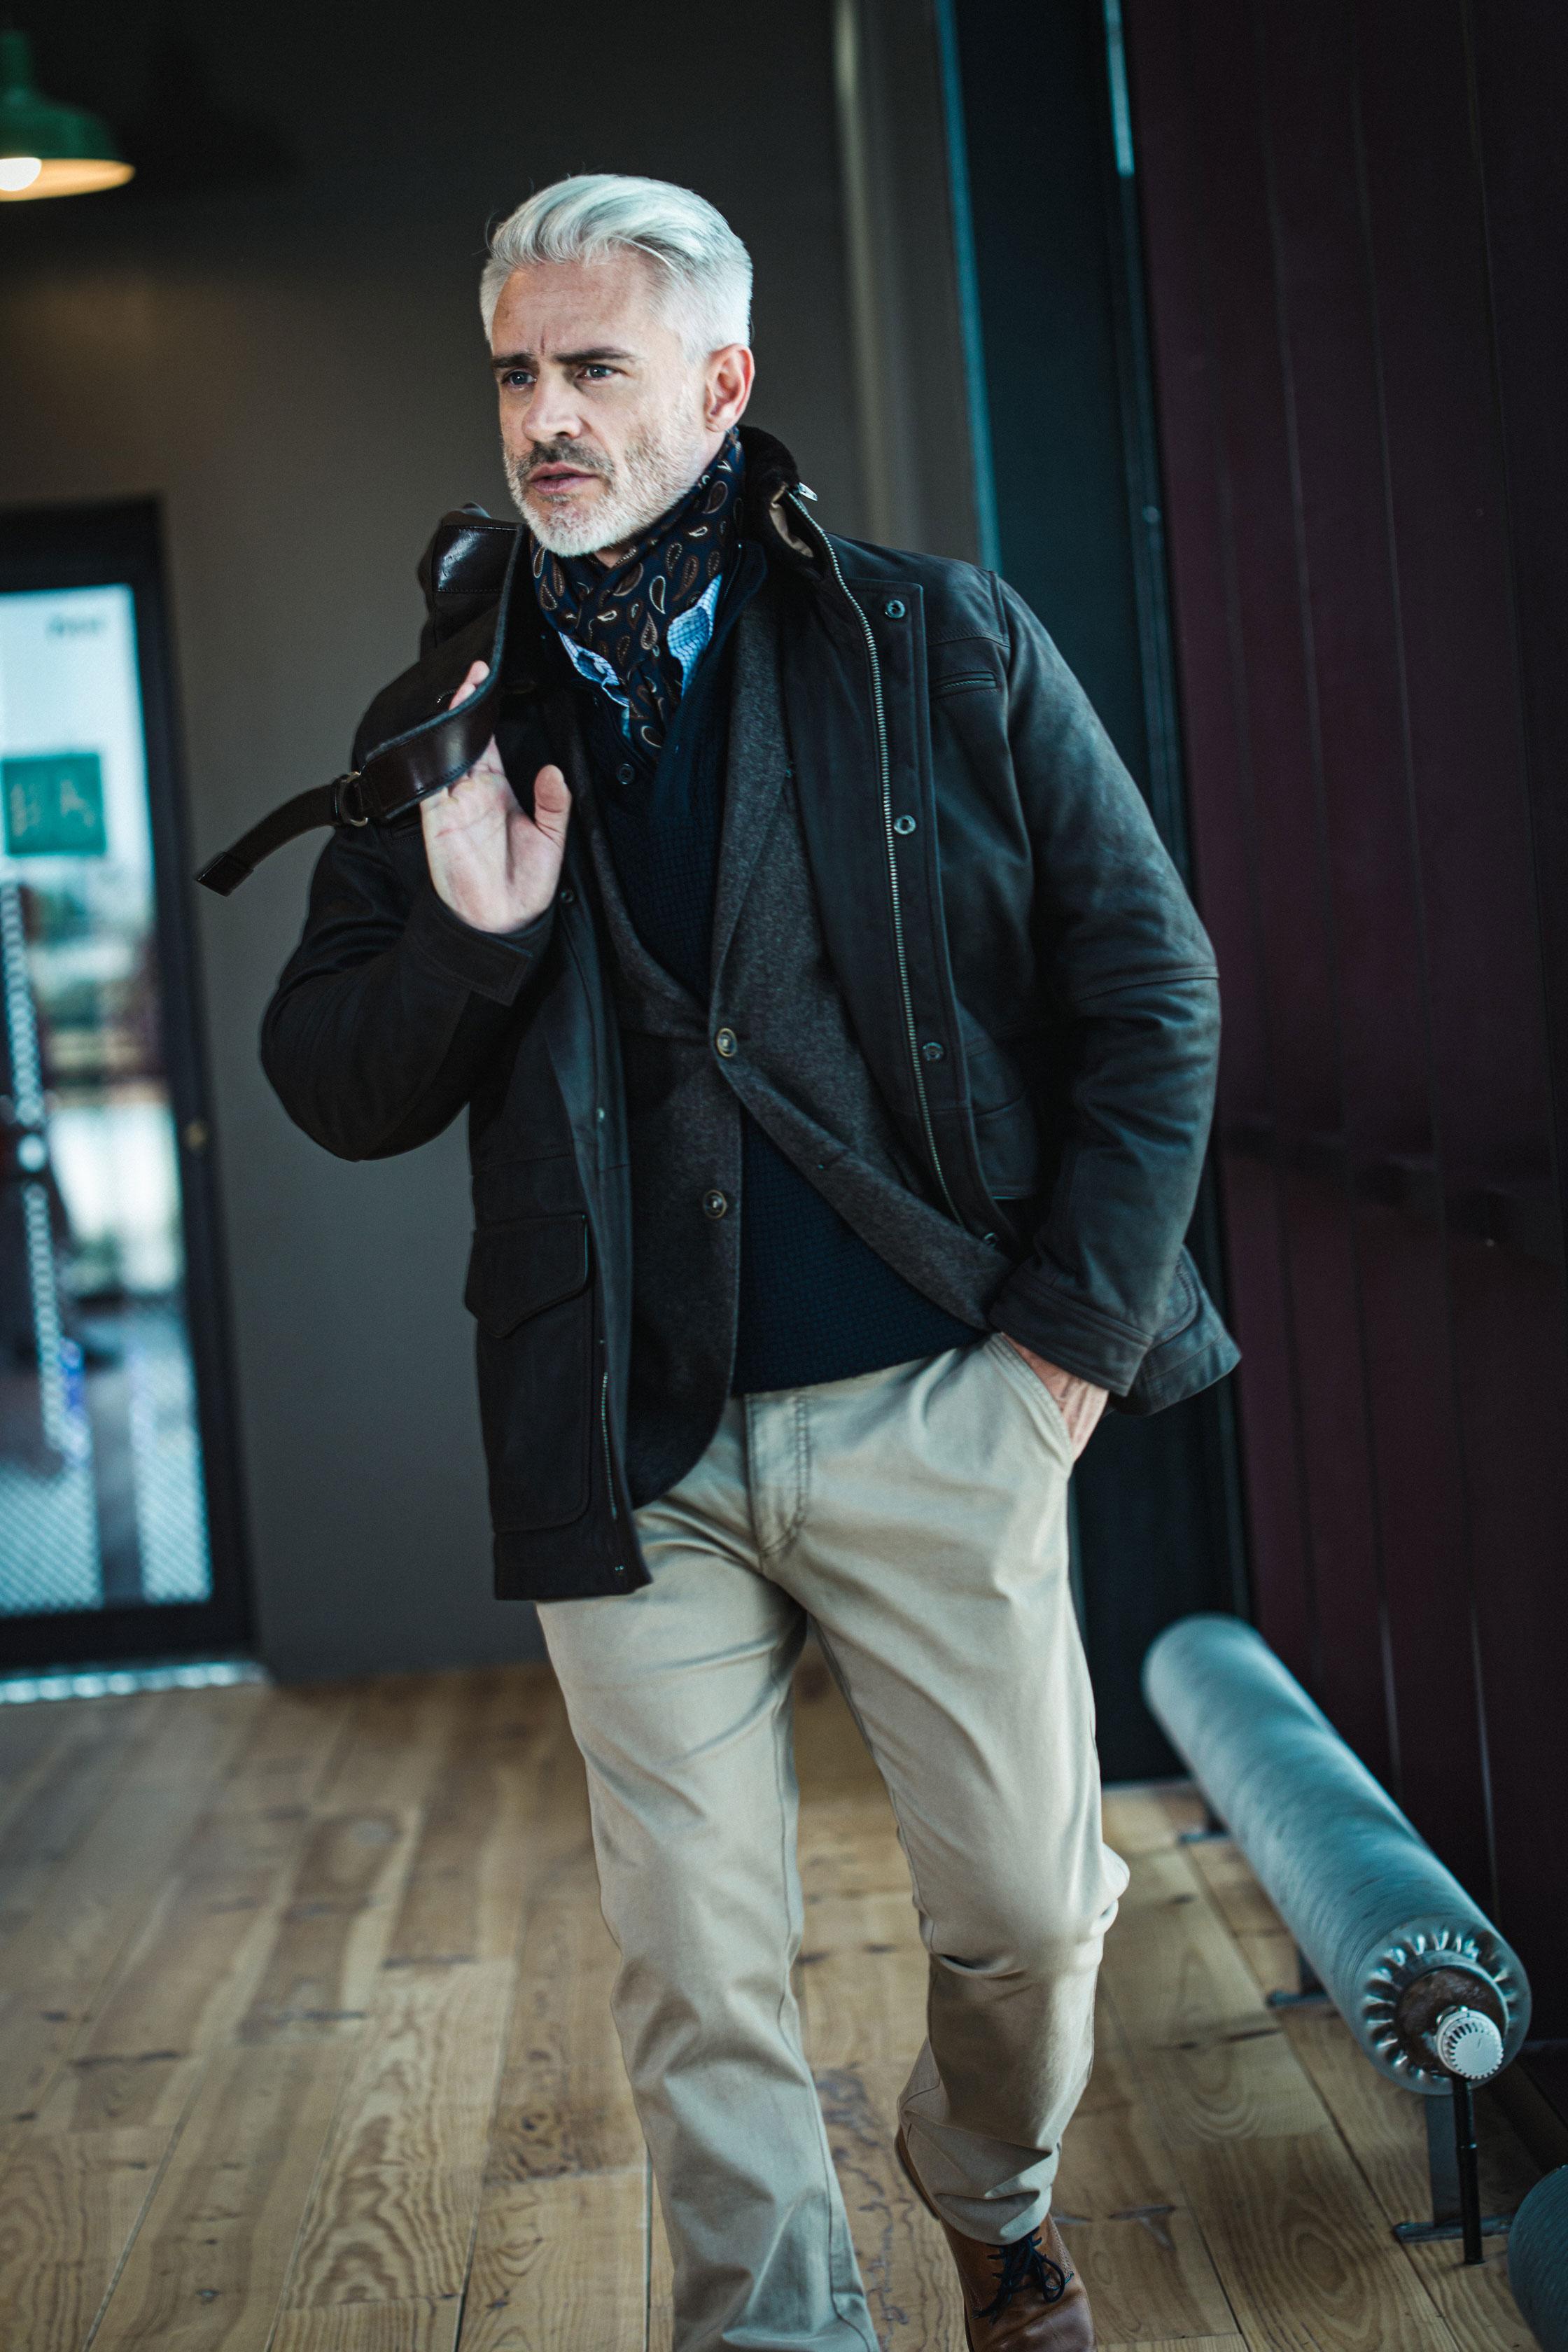 Bayard collection Automne-hiver 2019 pantalon